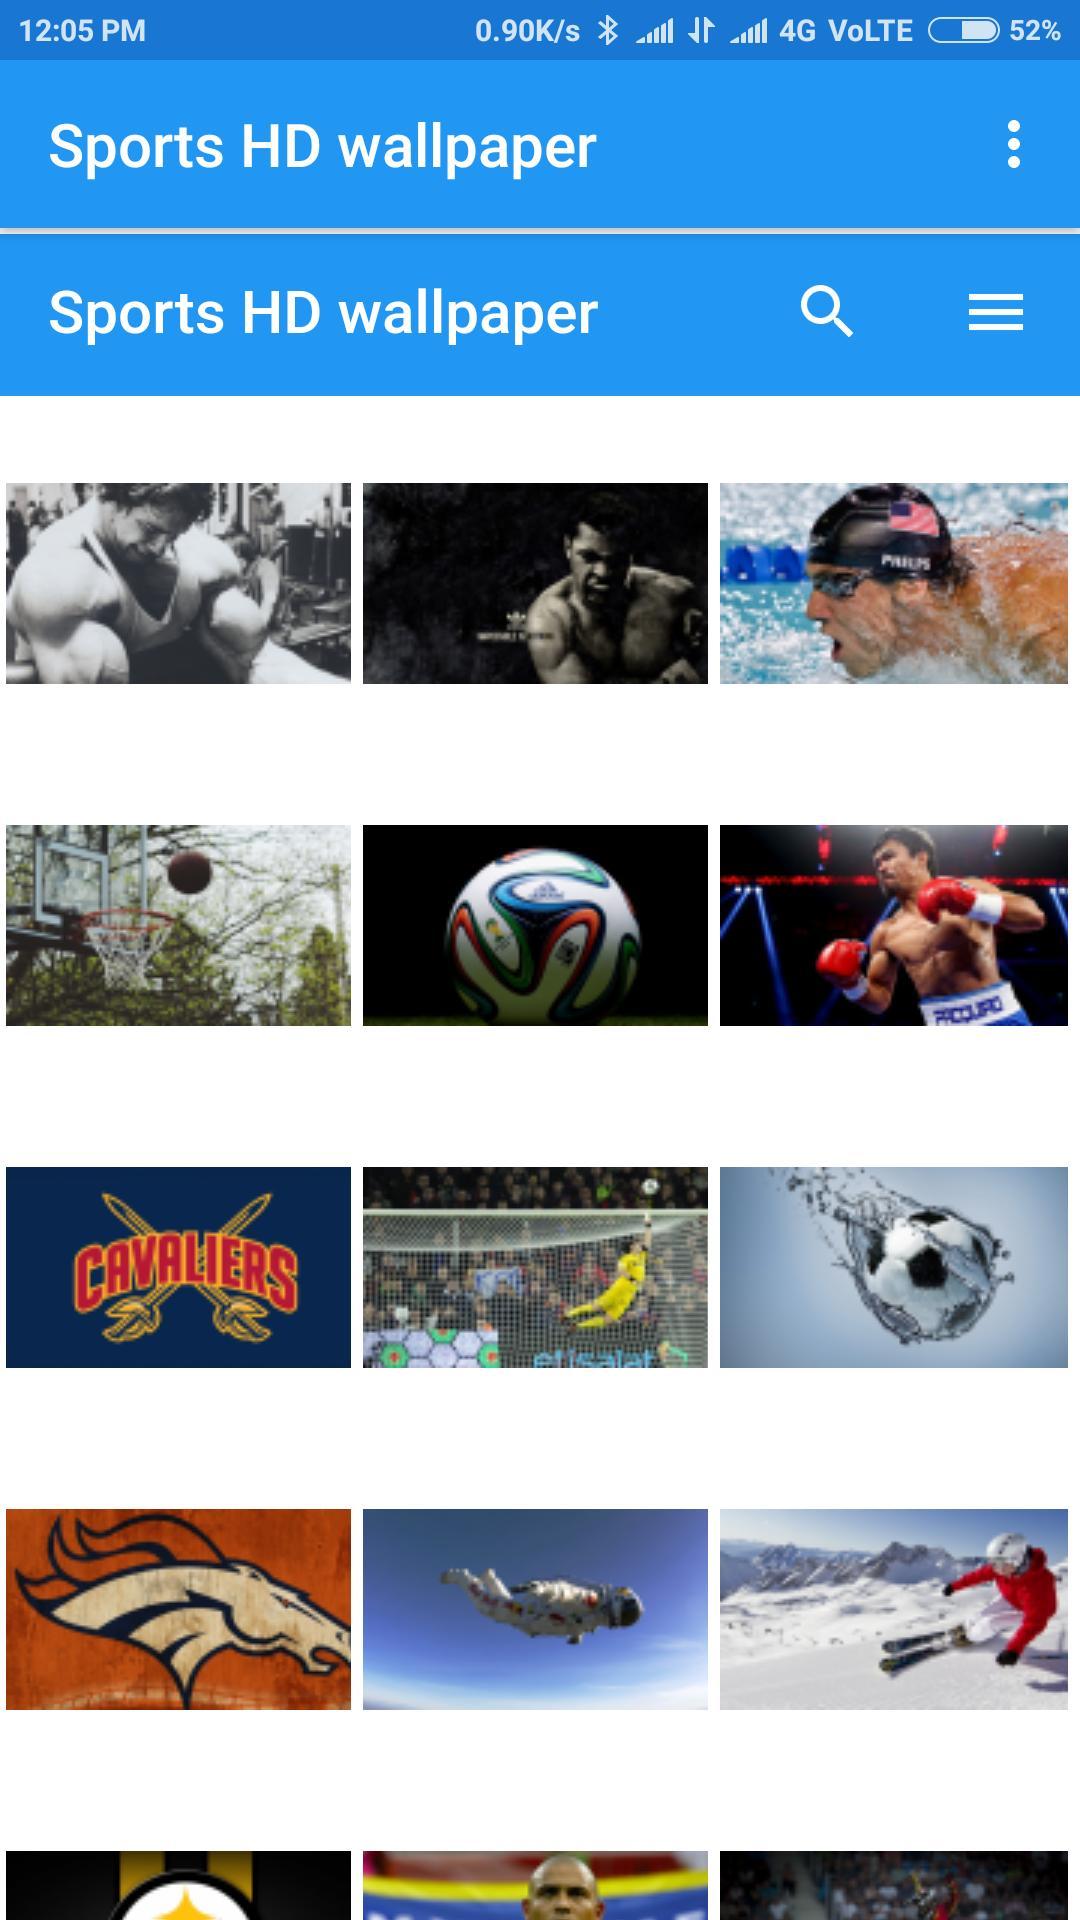 Sports HD wallpaper poster